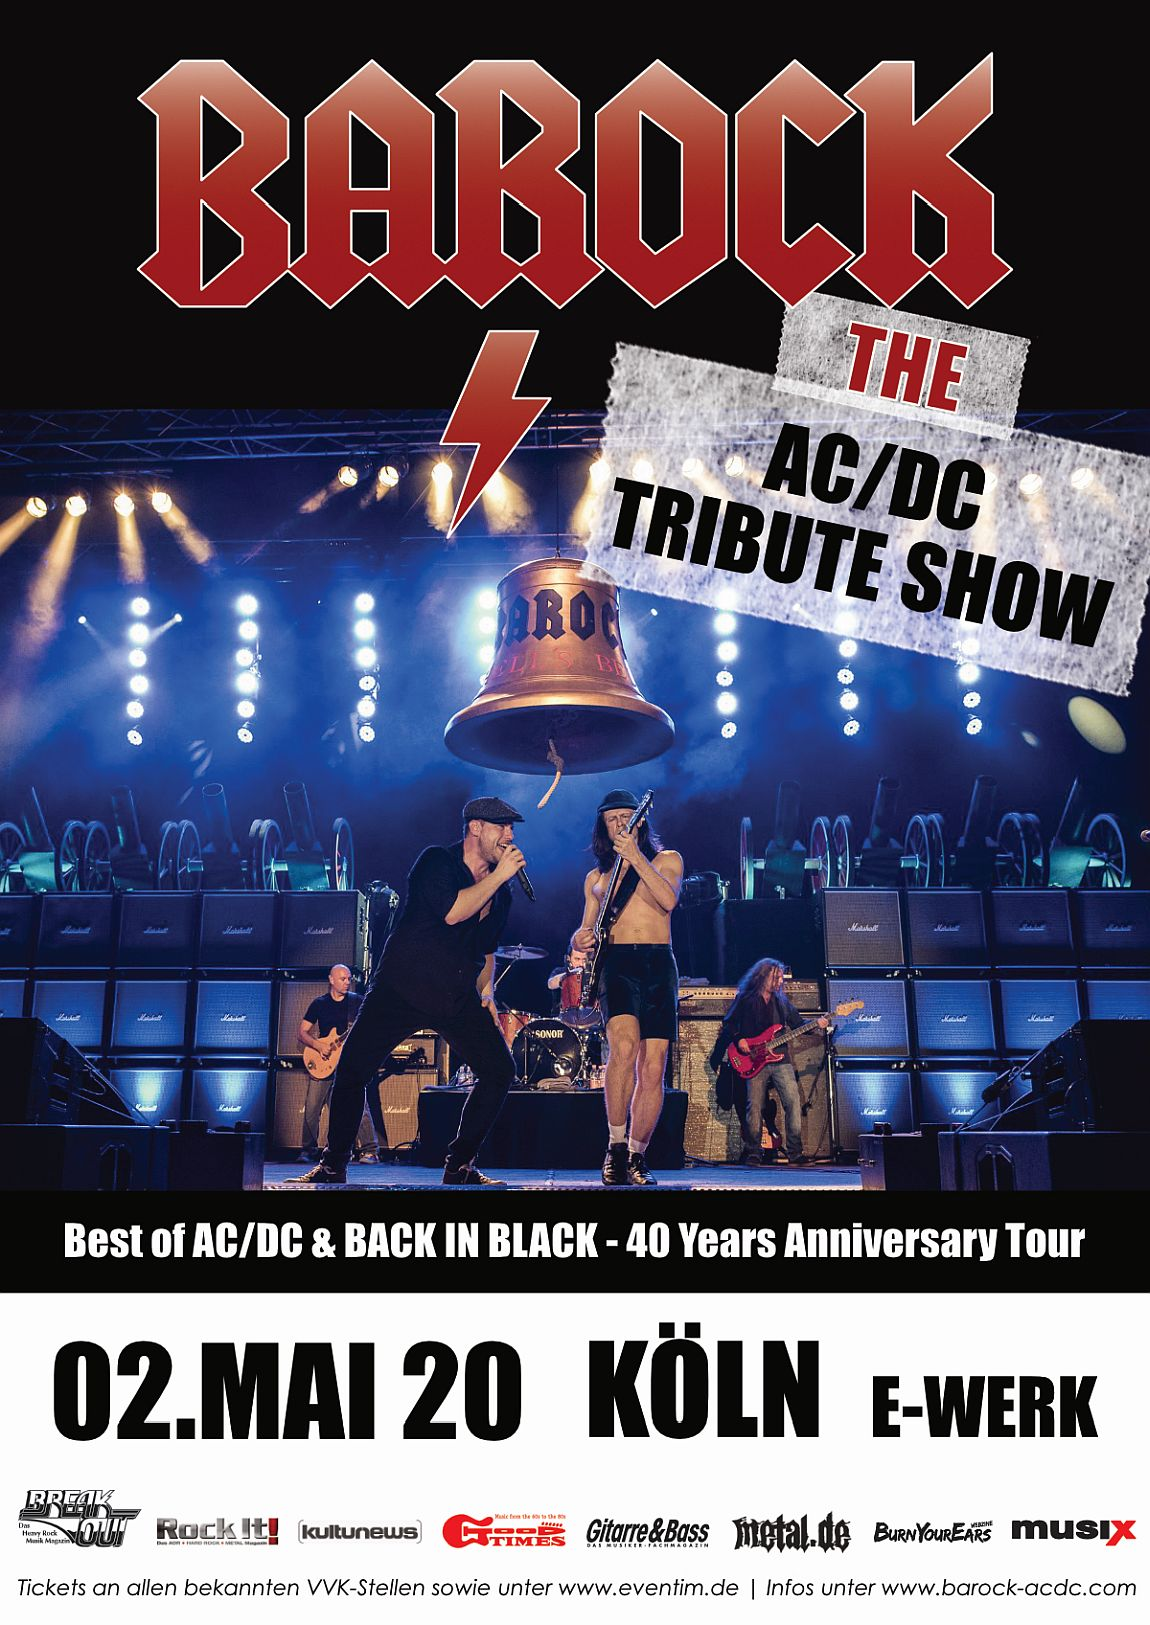 Barock 40 Years Back In Black Anniversary Tour